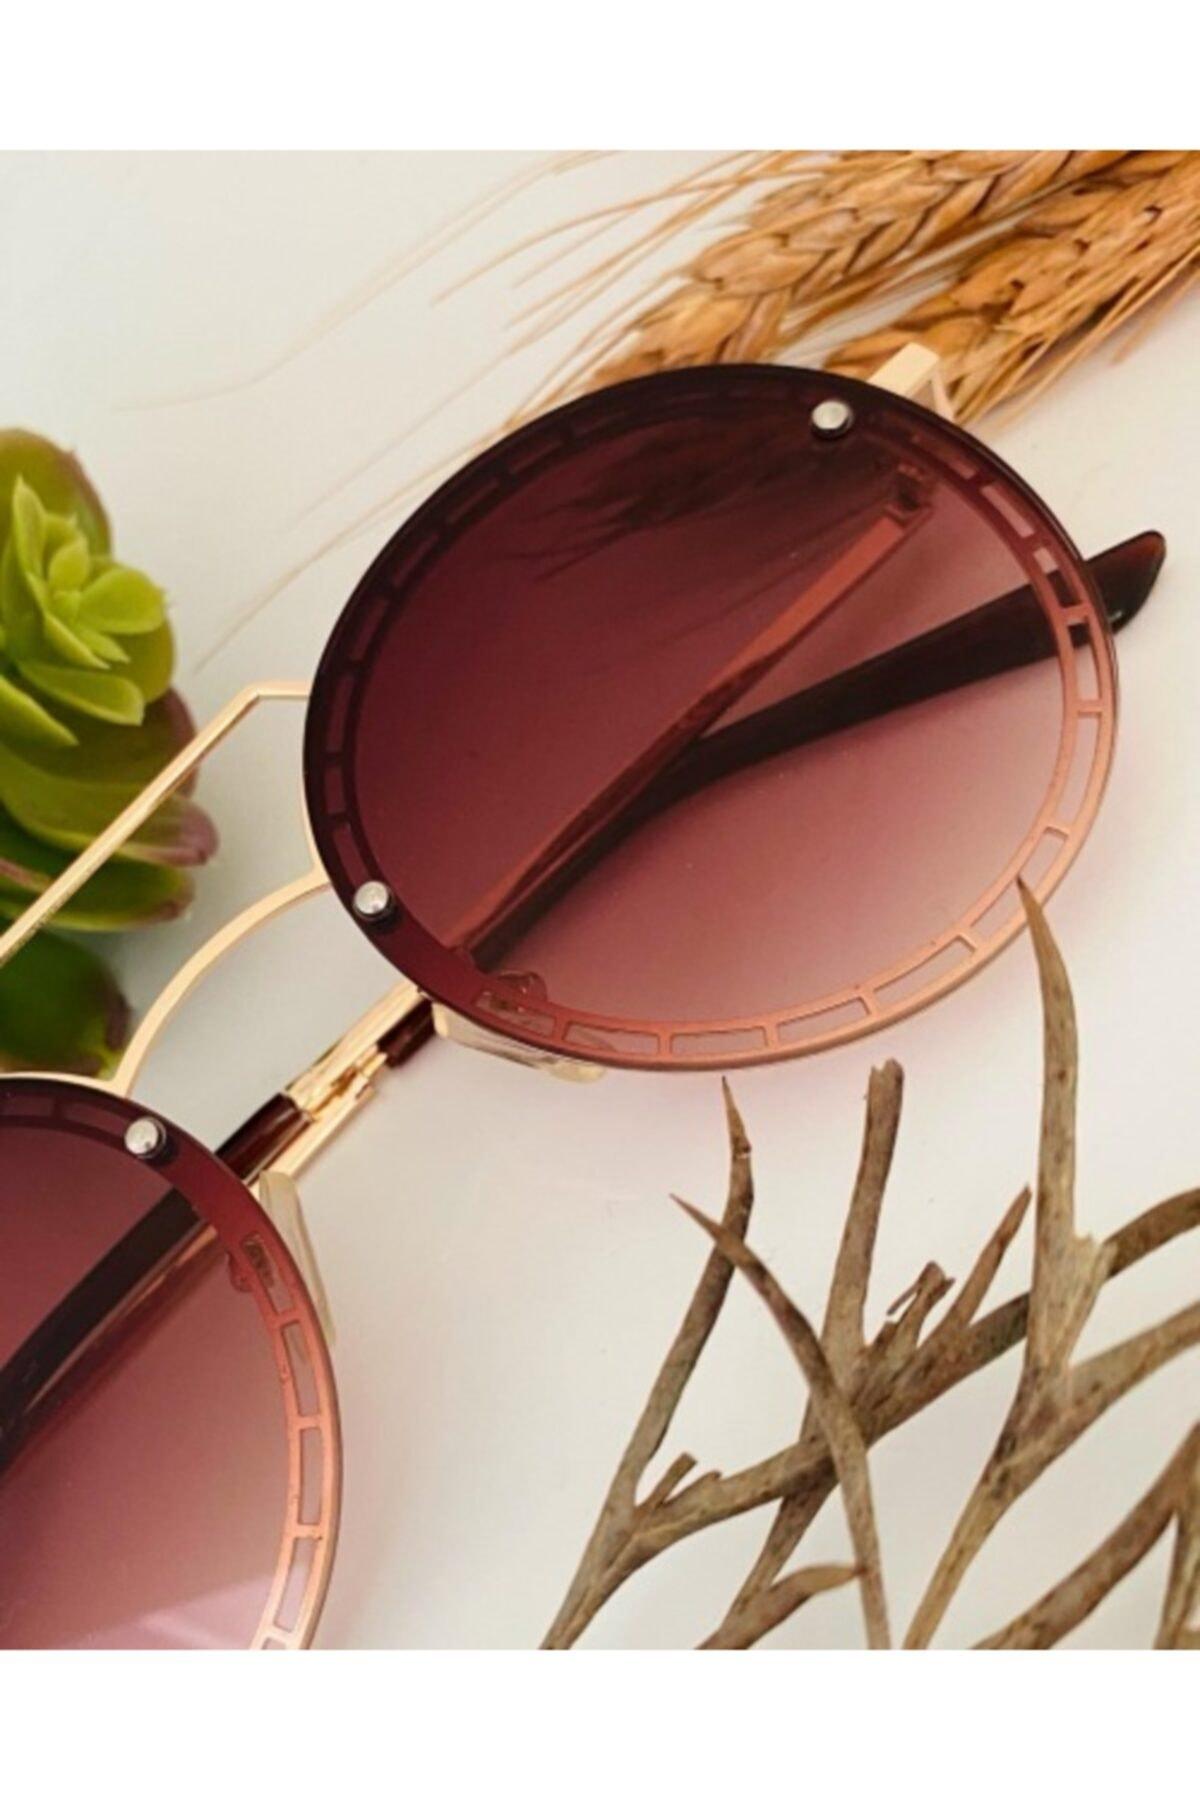 Max Polo Kadın Güneş Gözlüğü 2